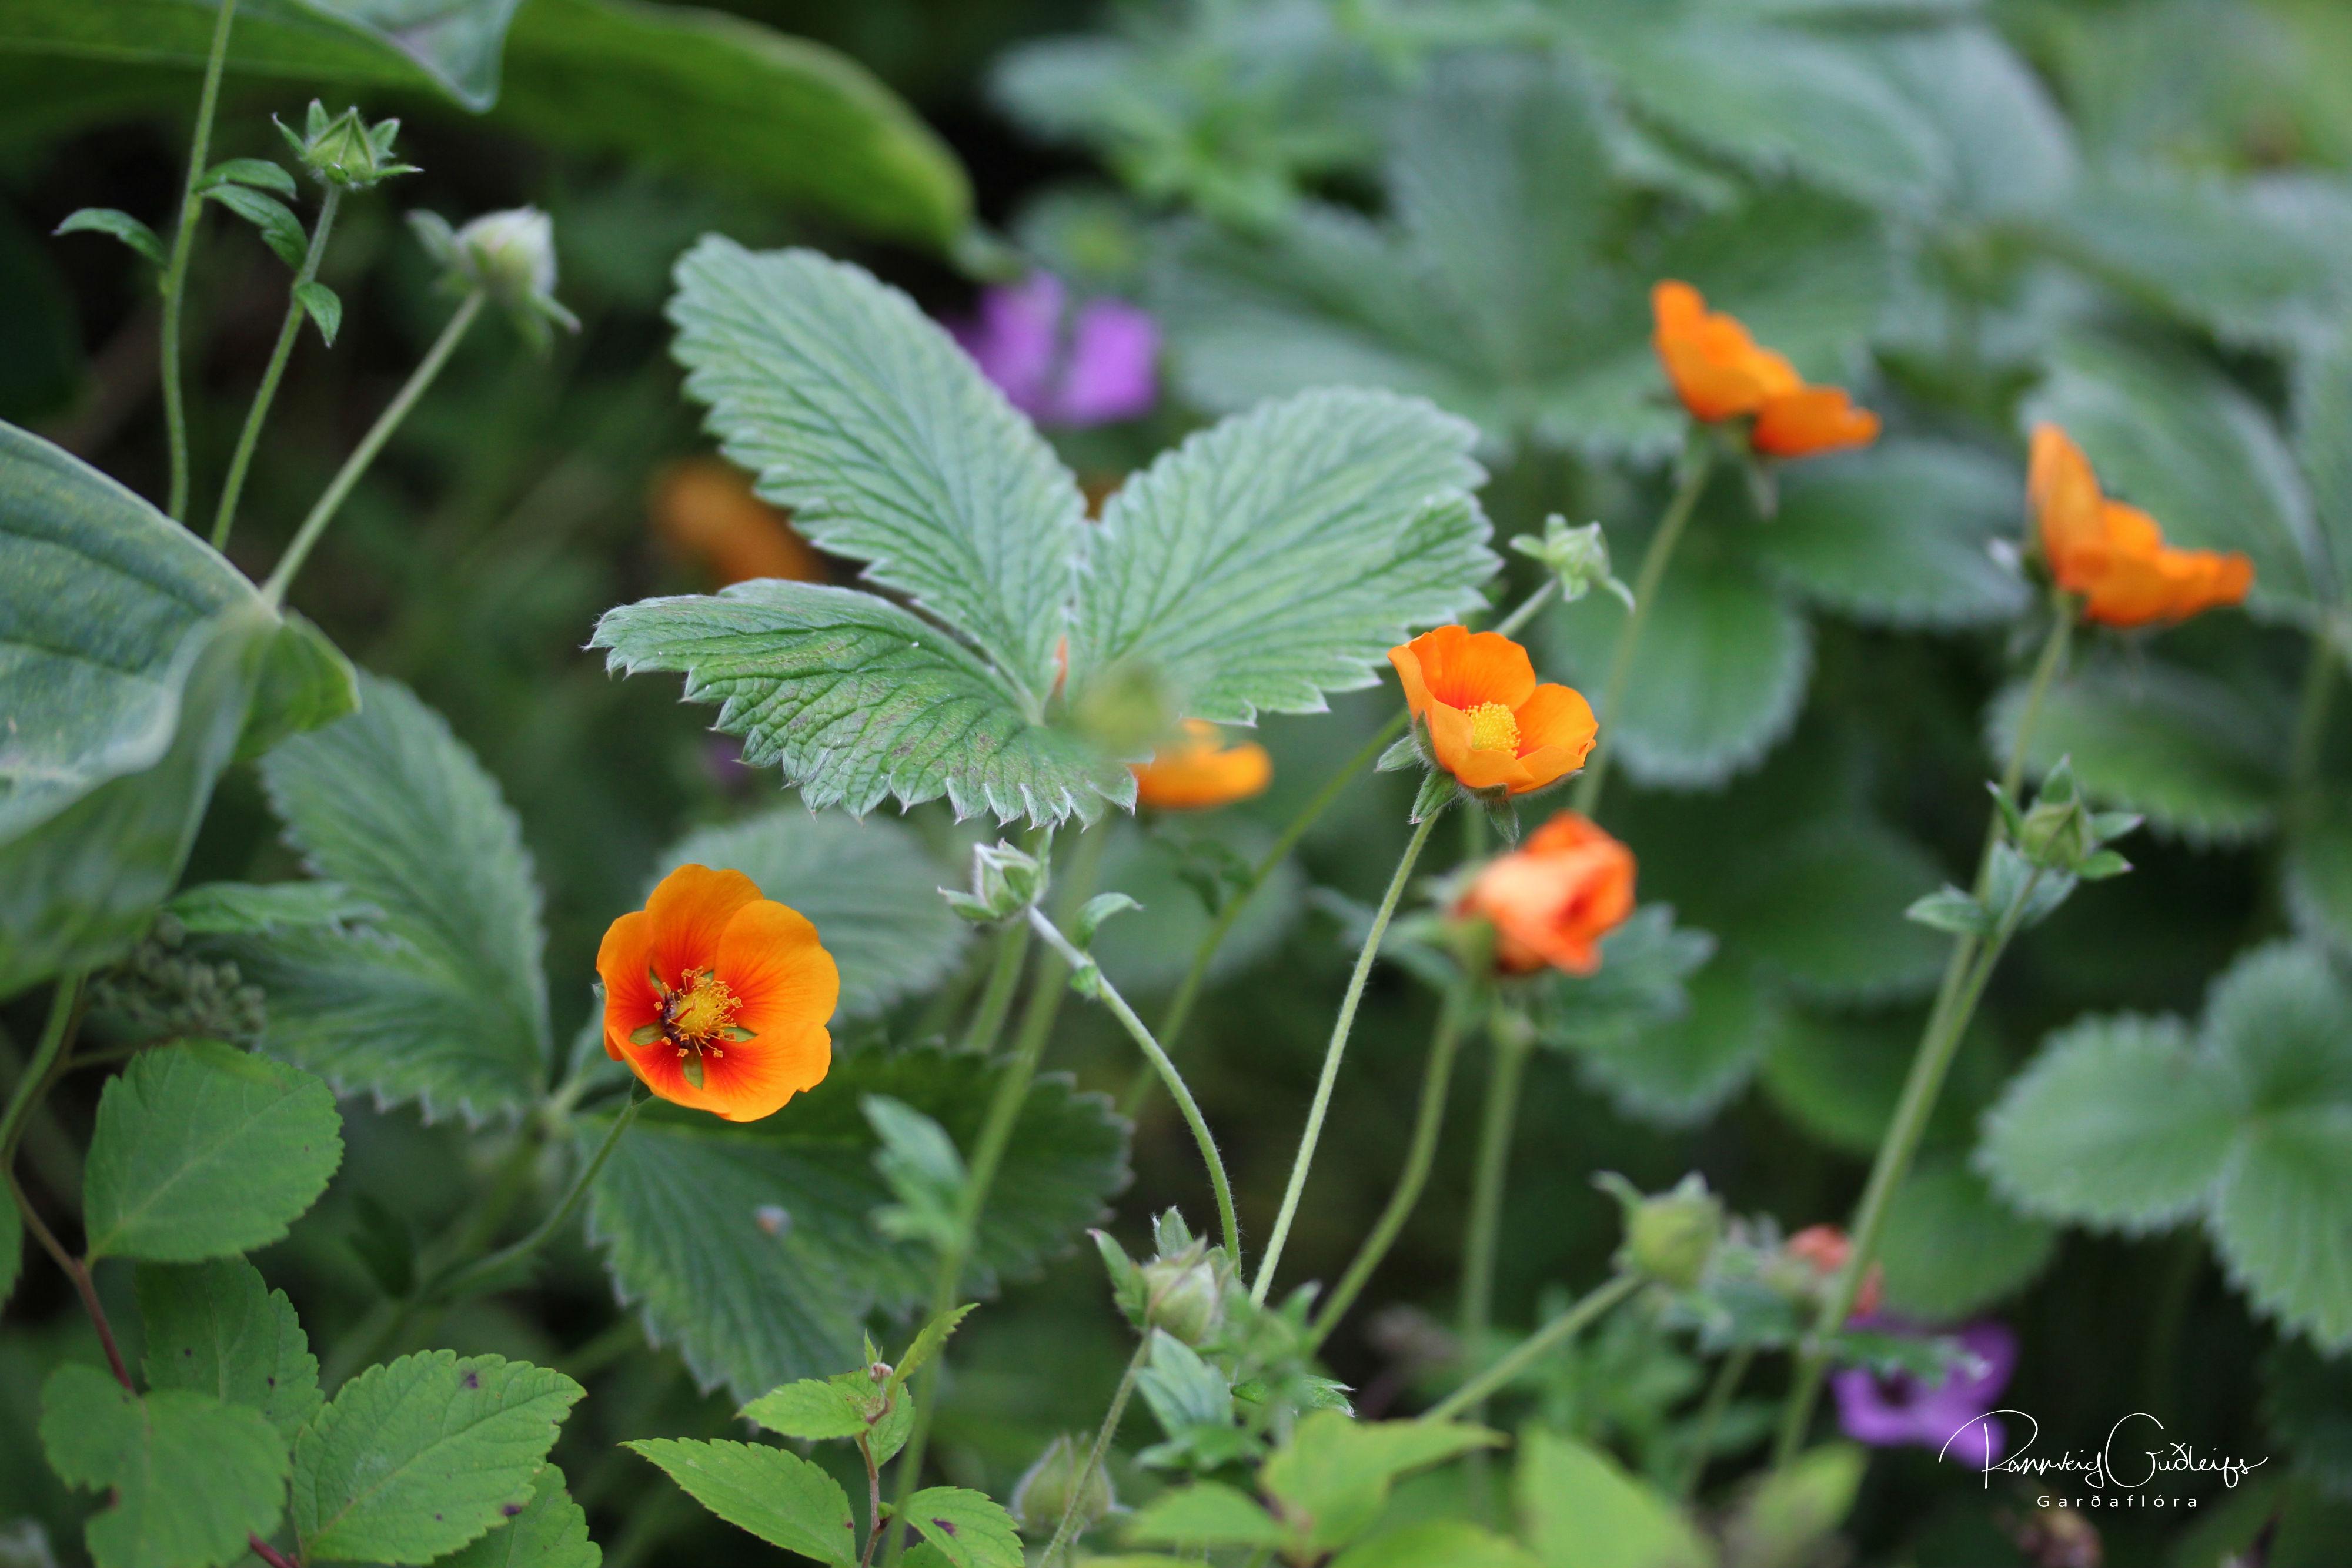 Potentilla atrosanguinea var. argyrophylla